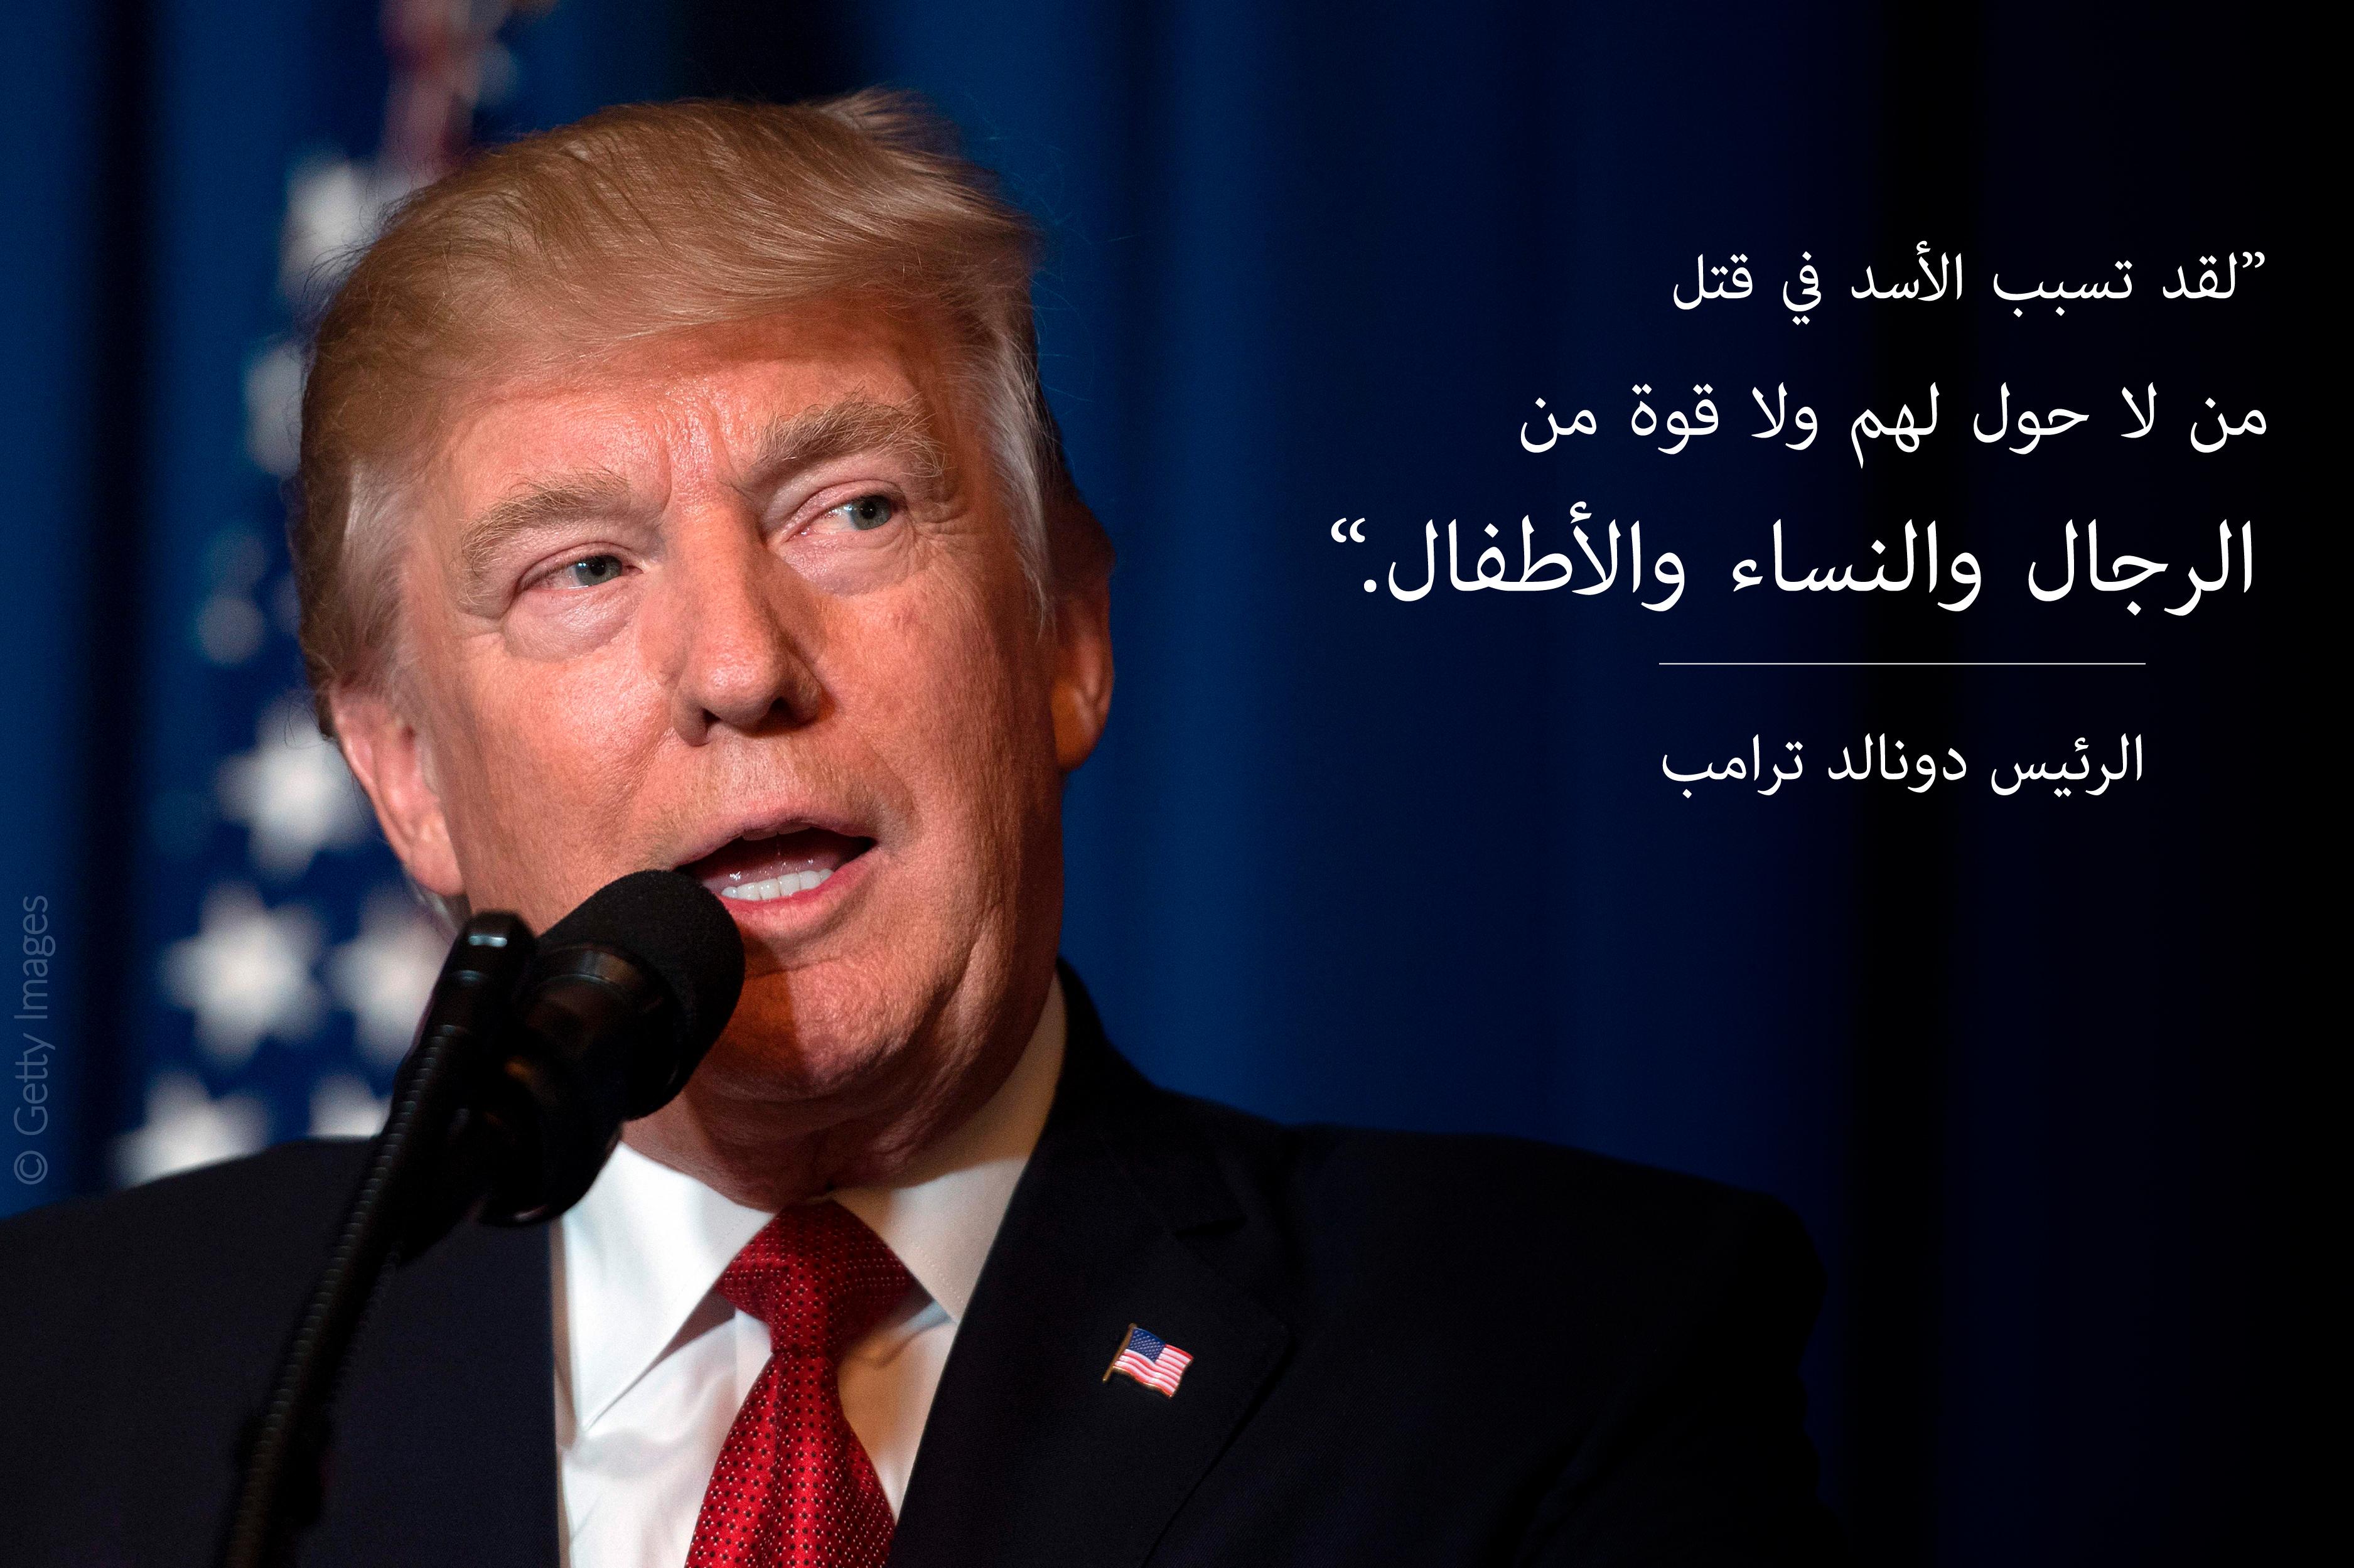 Trump_Arabic-01